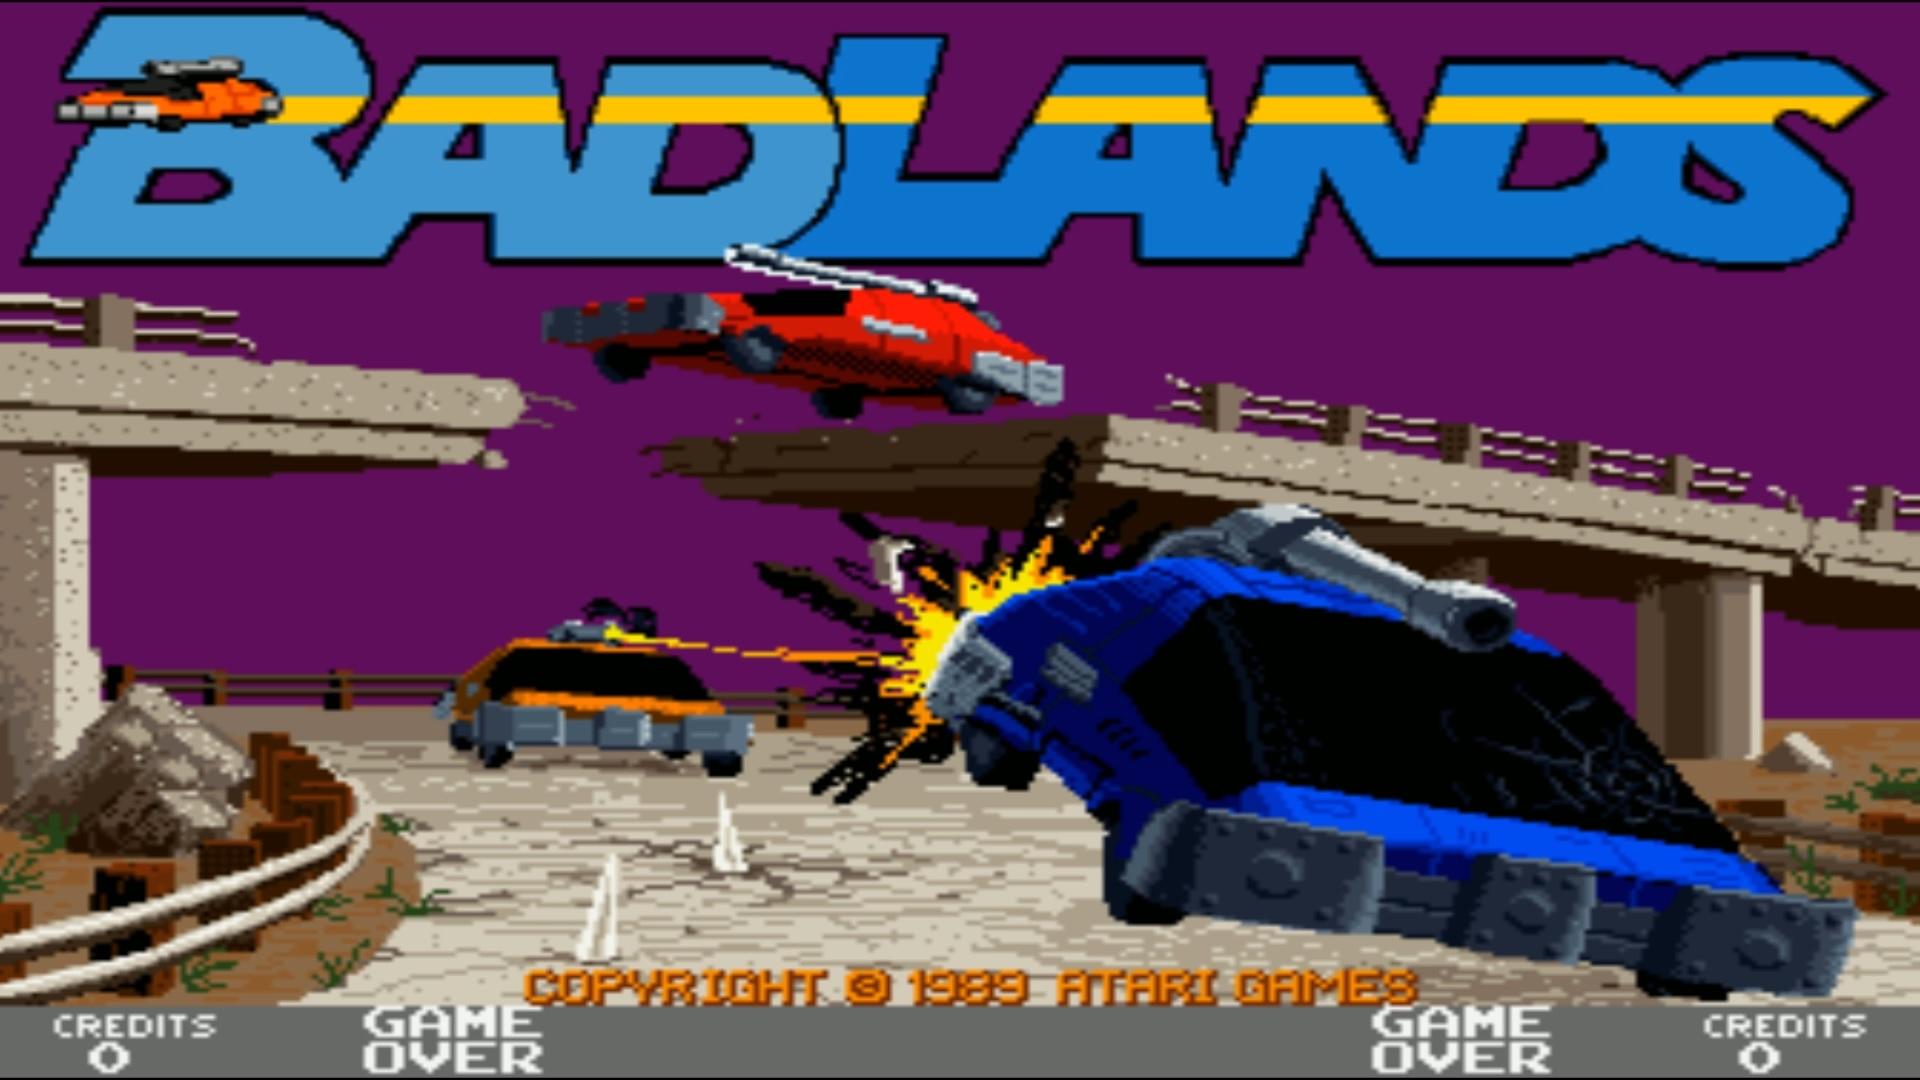 Badlands arcade game from 1989